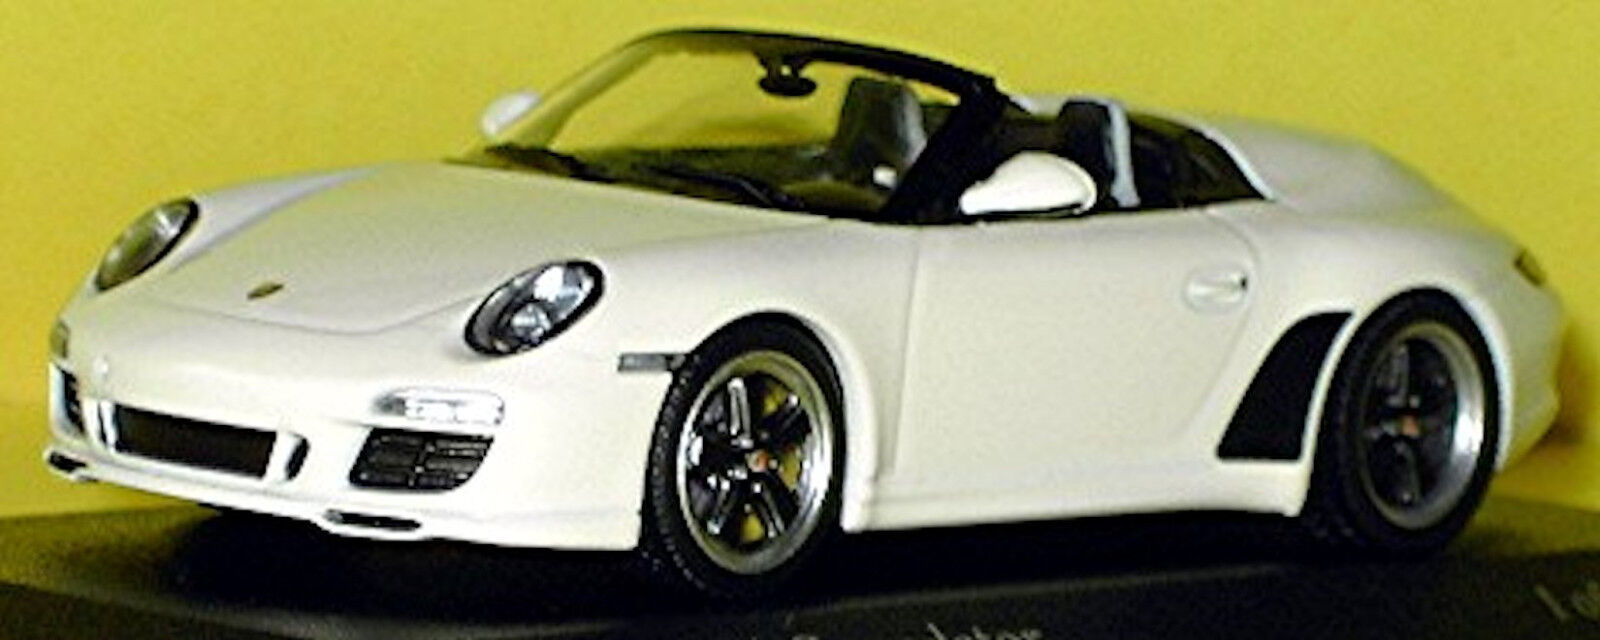 Porsche 911 Speedster Type  997 II 2010-11 Carrera Blanc Blanc 1 43 Minichamps